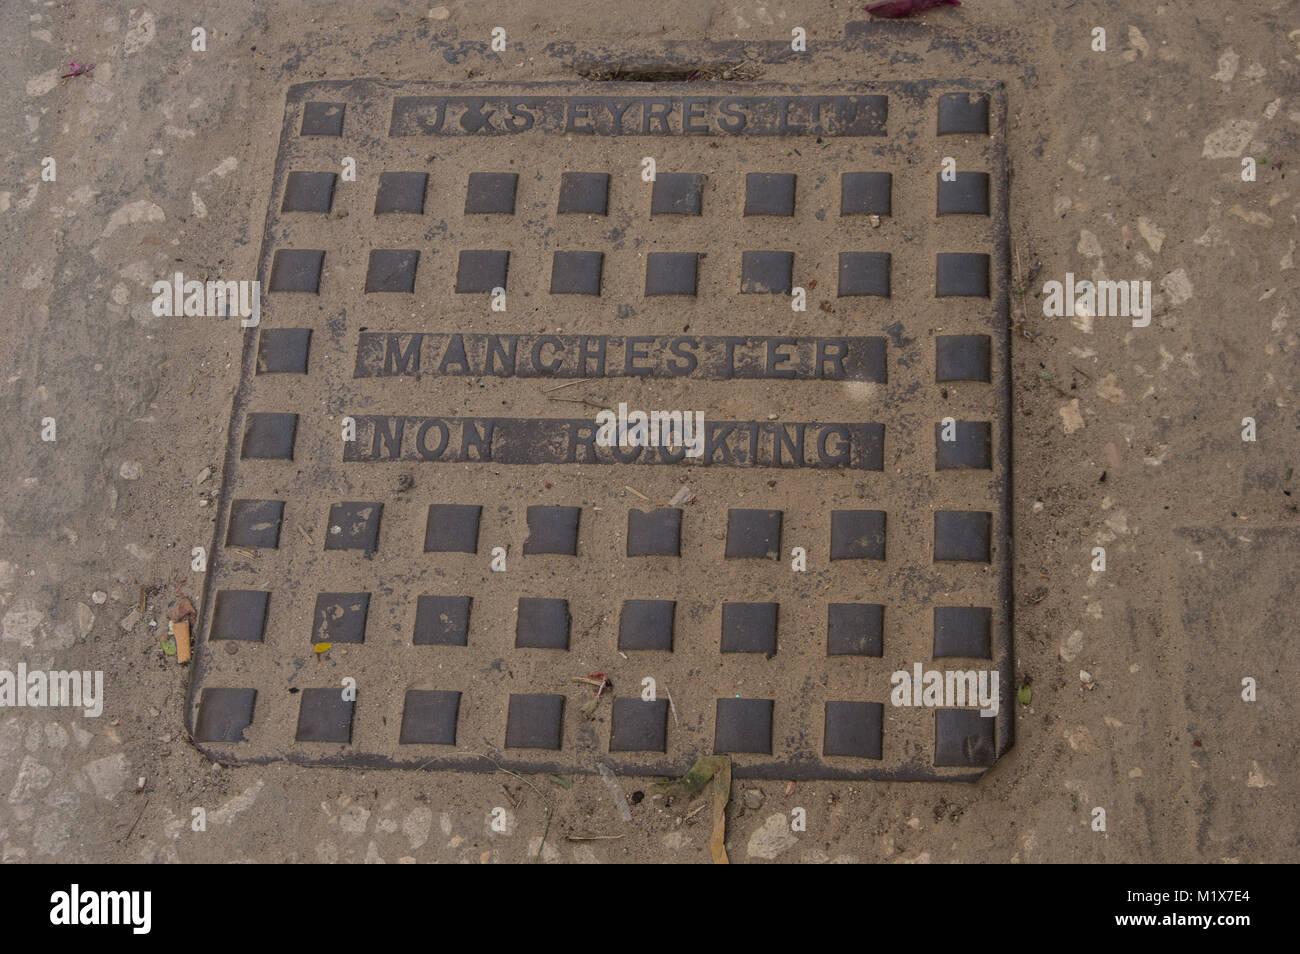 J & S Eyres Non Rocking Manchester square iron manhole cover on the street in Stone Town Zancibar City Zanzibar - Stock Image